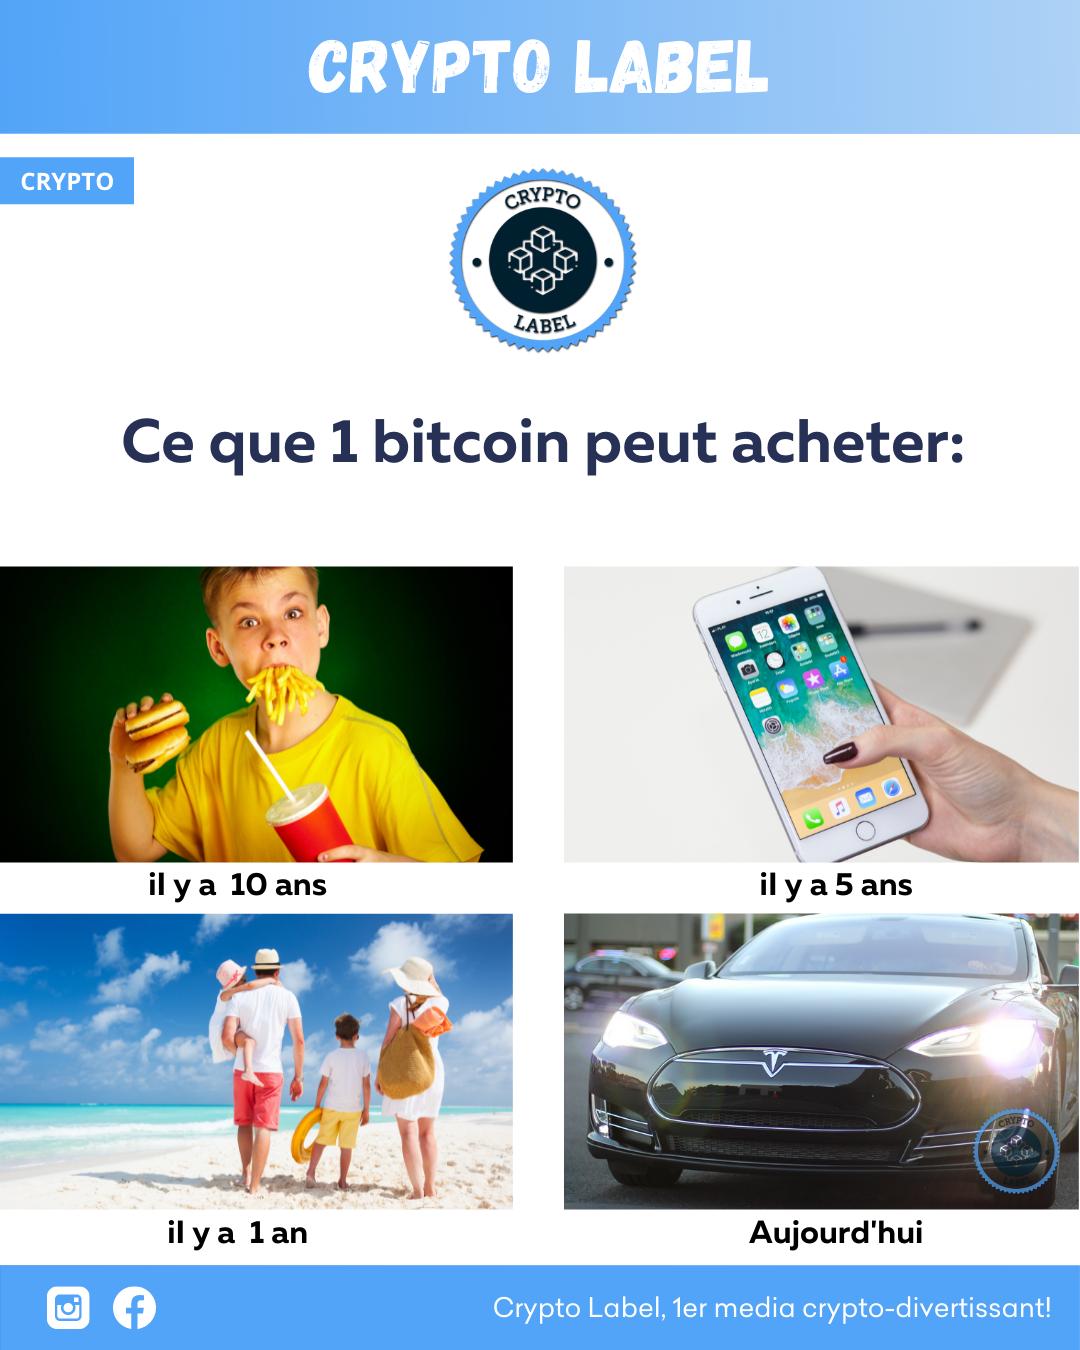 Ce que 1 bitcoin peut acheter - Crypto-Label